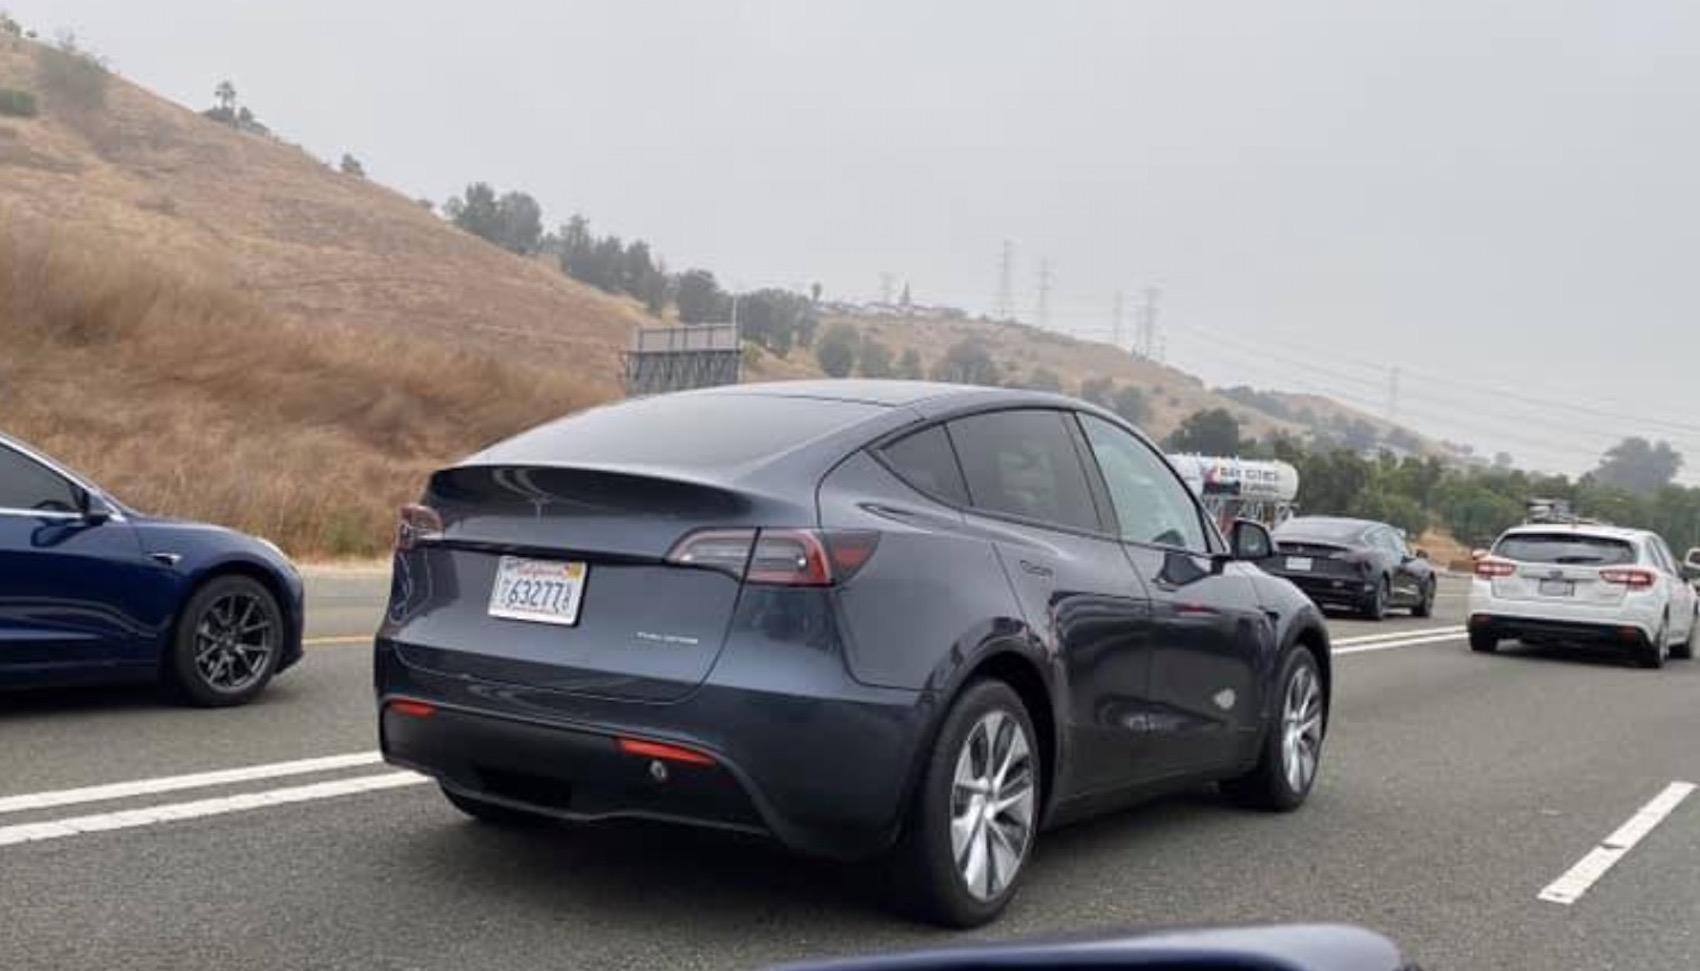 Tesla Modely Gris Calles